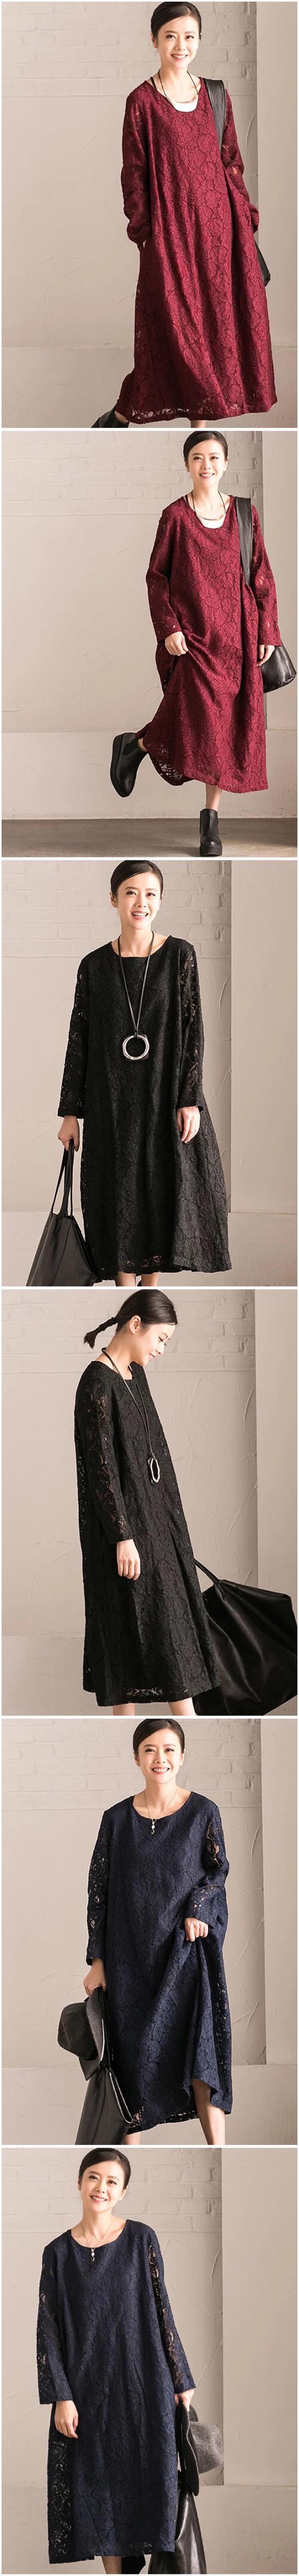 Redblackblue lace long dresses qa clothes u style